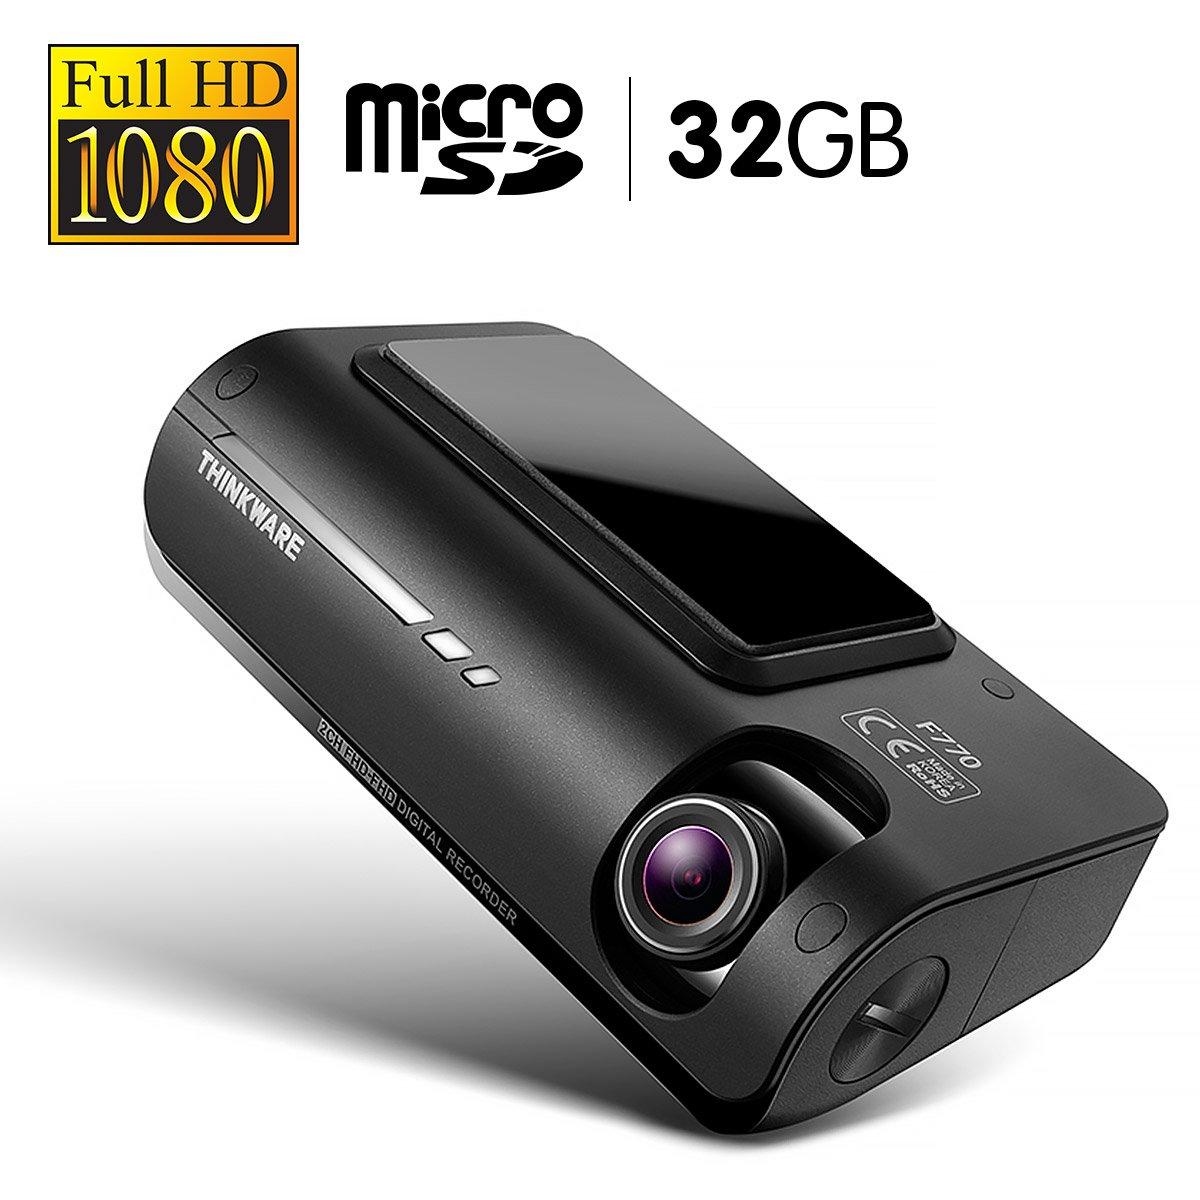 THINKWARE 1080P Full HD Dash Cam With 32GB Micro SD - F77032